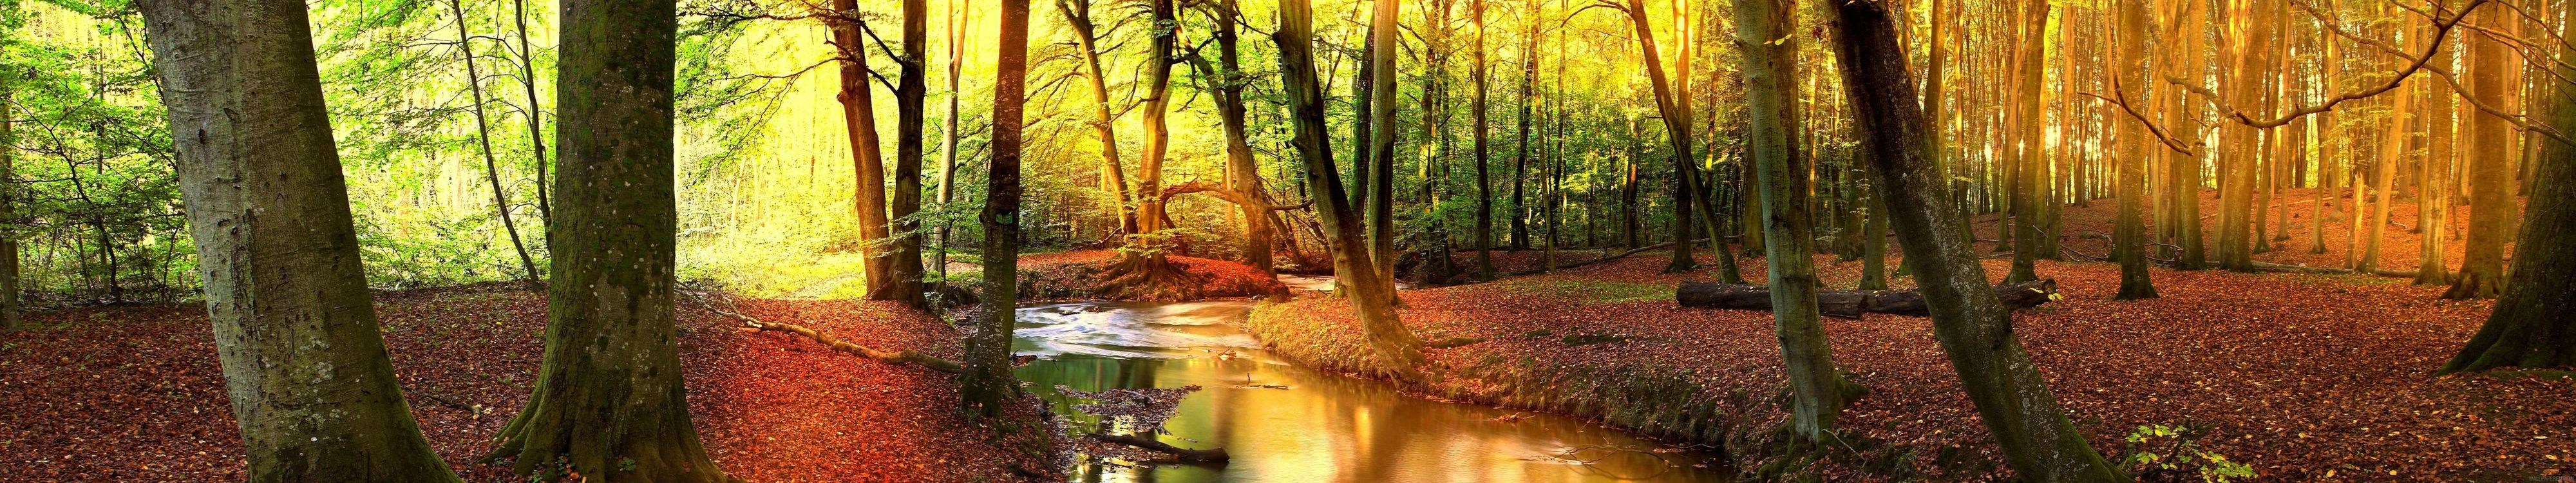 Фото бесплатно арбра, лес, форе - на рабочий стол